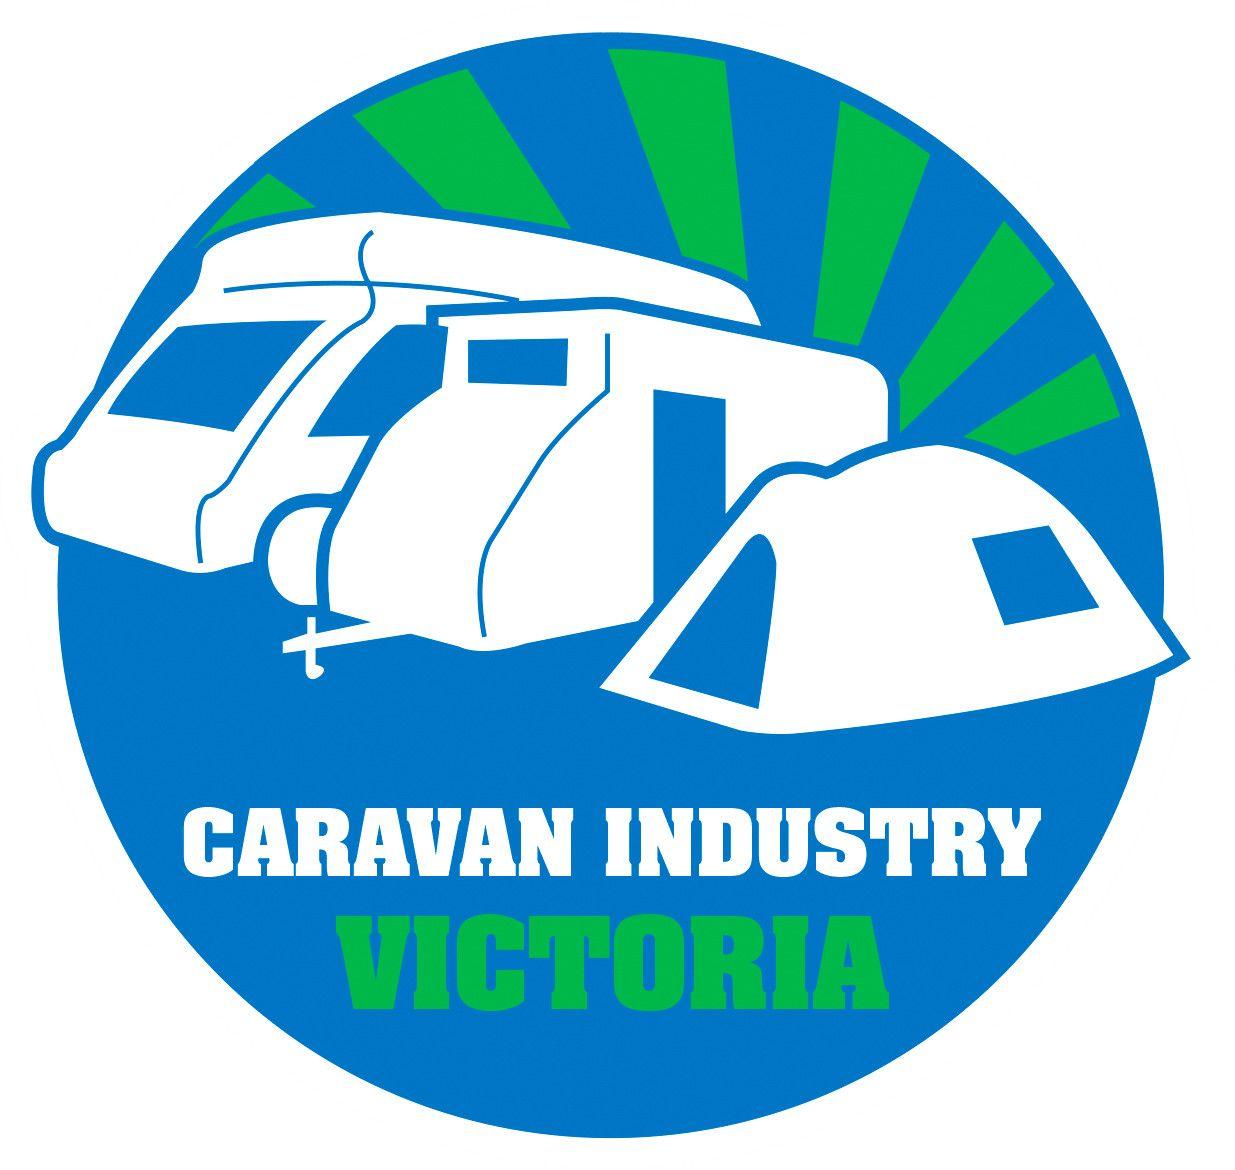 Caravan industry oxf victoria